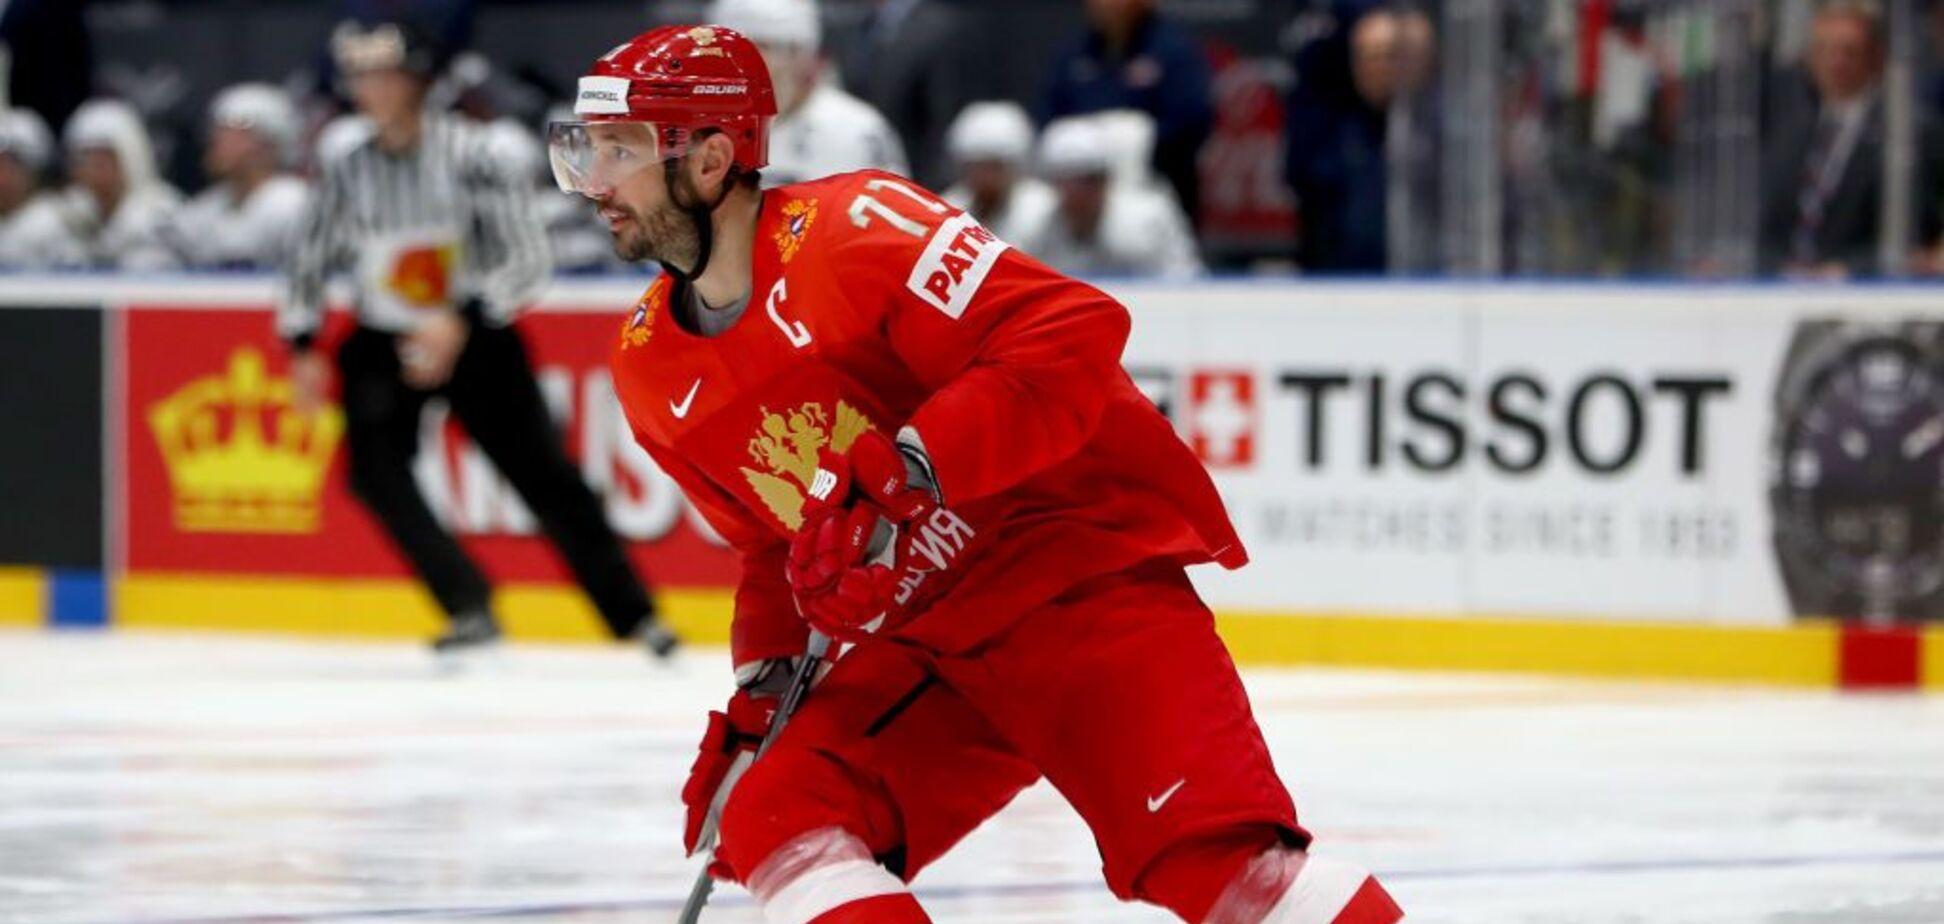 Росія – Фінляндія: рахунок 1/2 фіналу чемпіонату світу з хокею